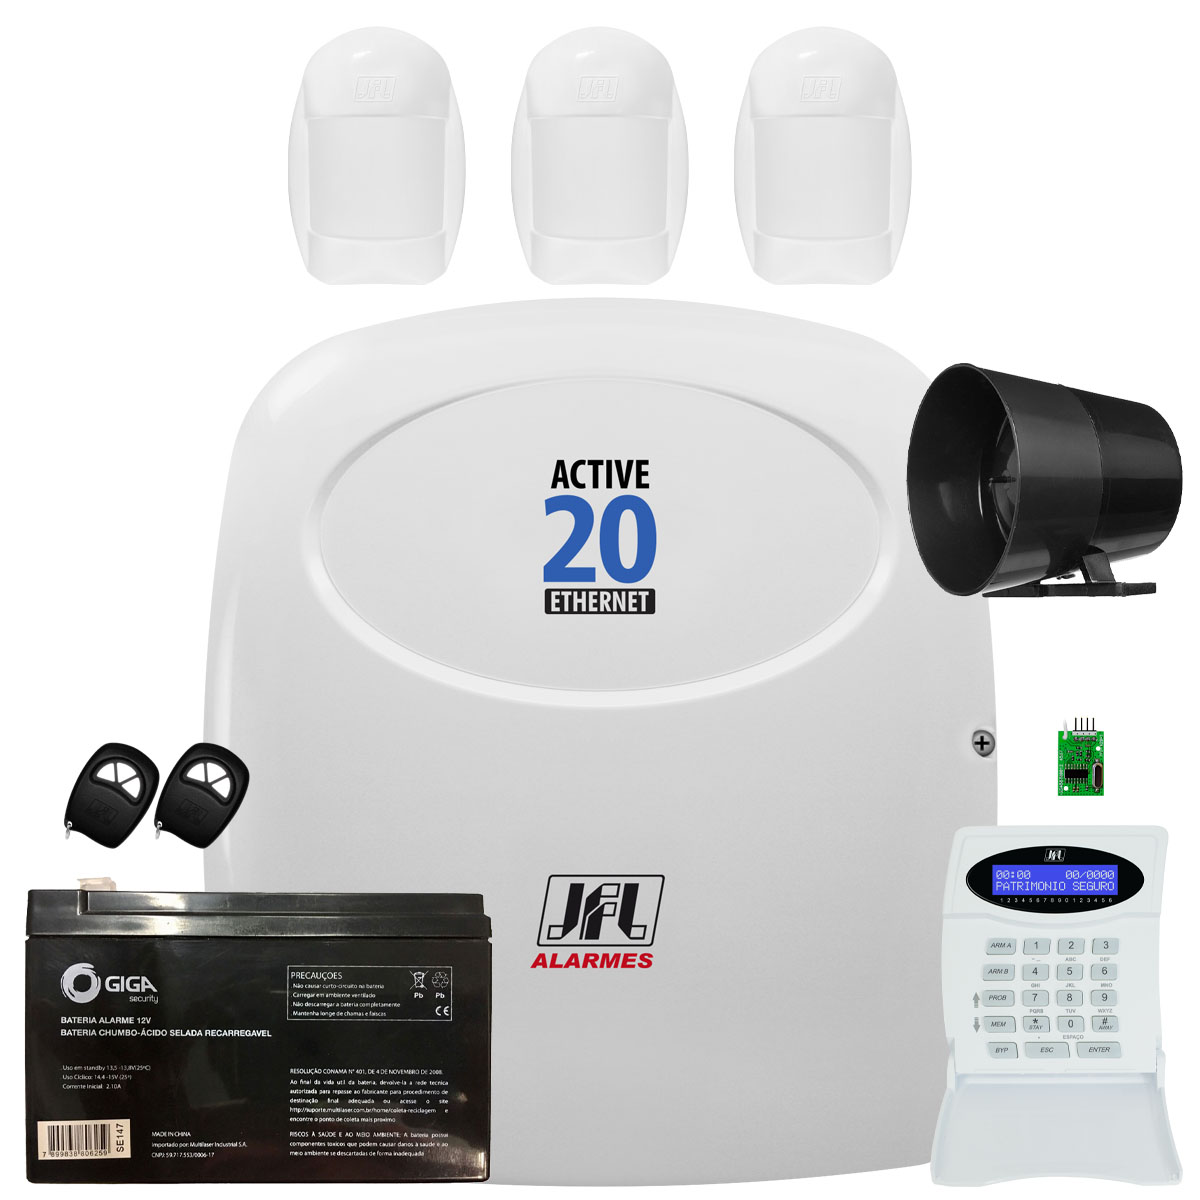 Kit Alarme Monitorado Active 20 Ethernet Acesso Via App Celular